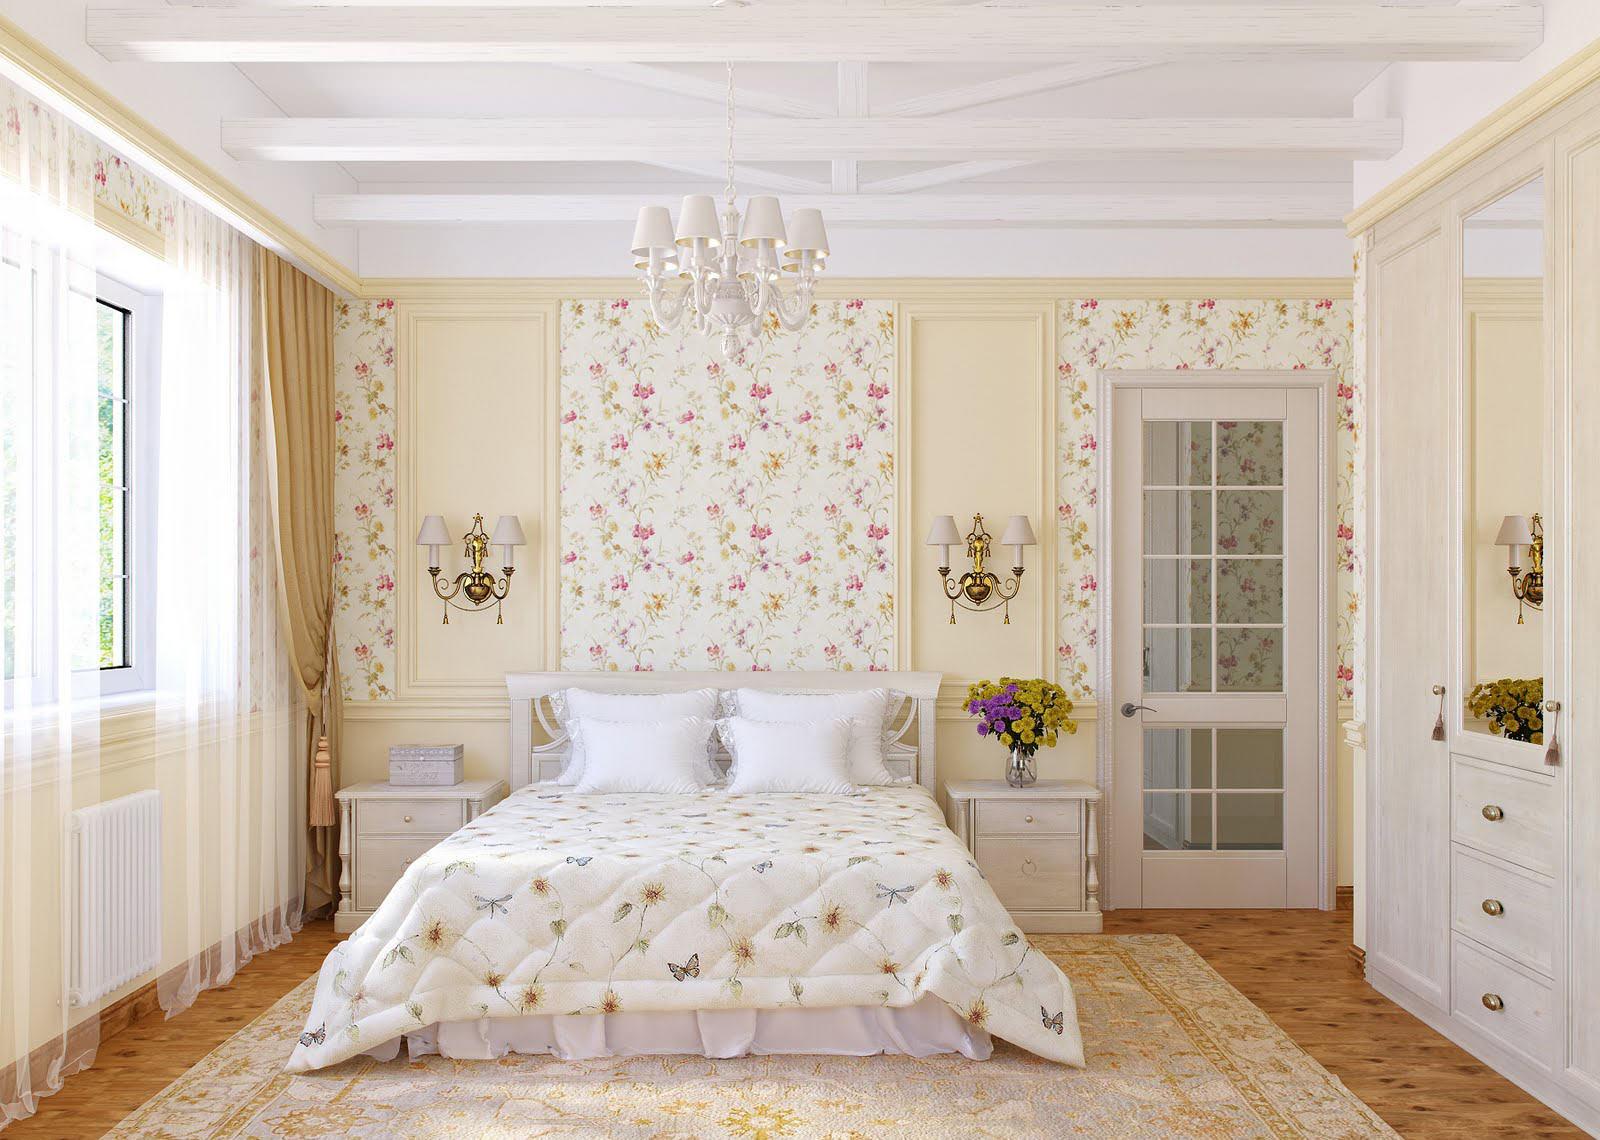 Бежево-белая спальня в стиле прованс